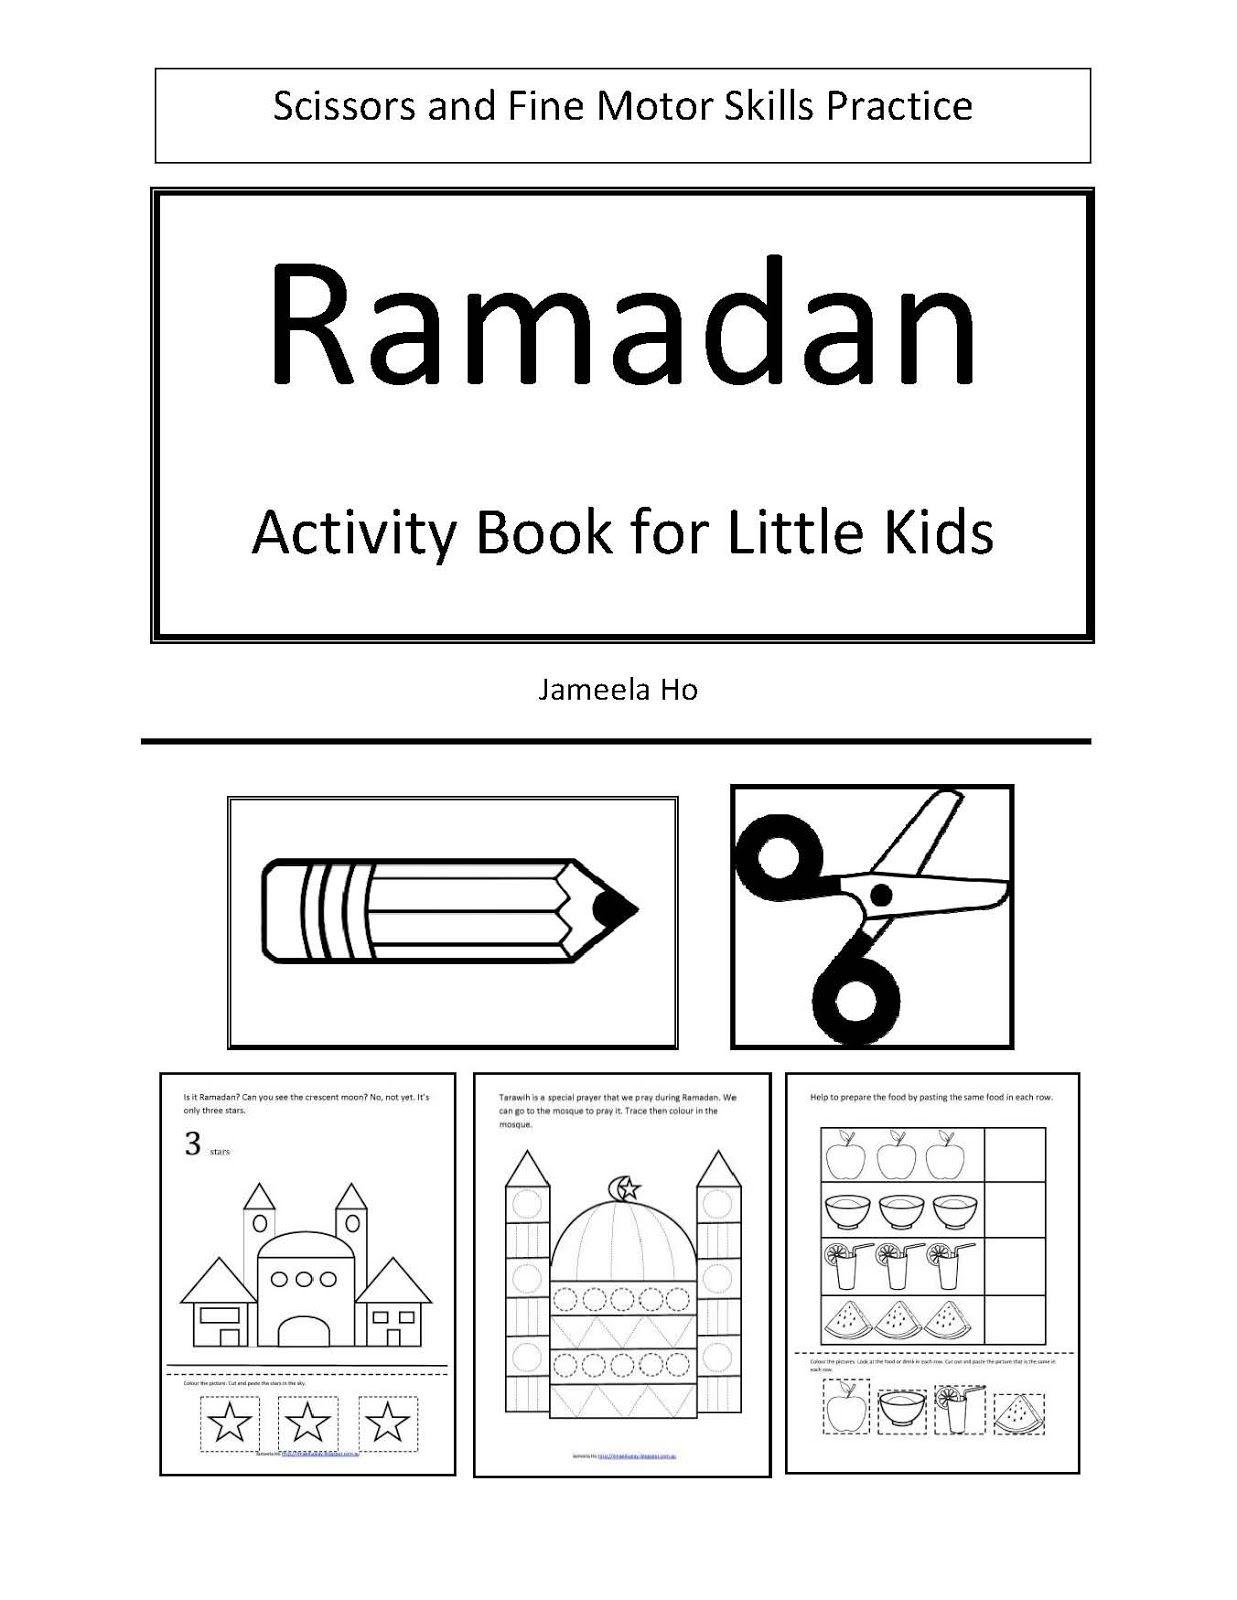 ilma educations eduparenting free download ramadan activity book for little kids - Kids Activities Book